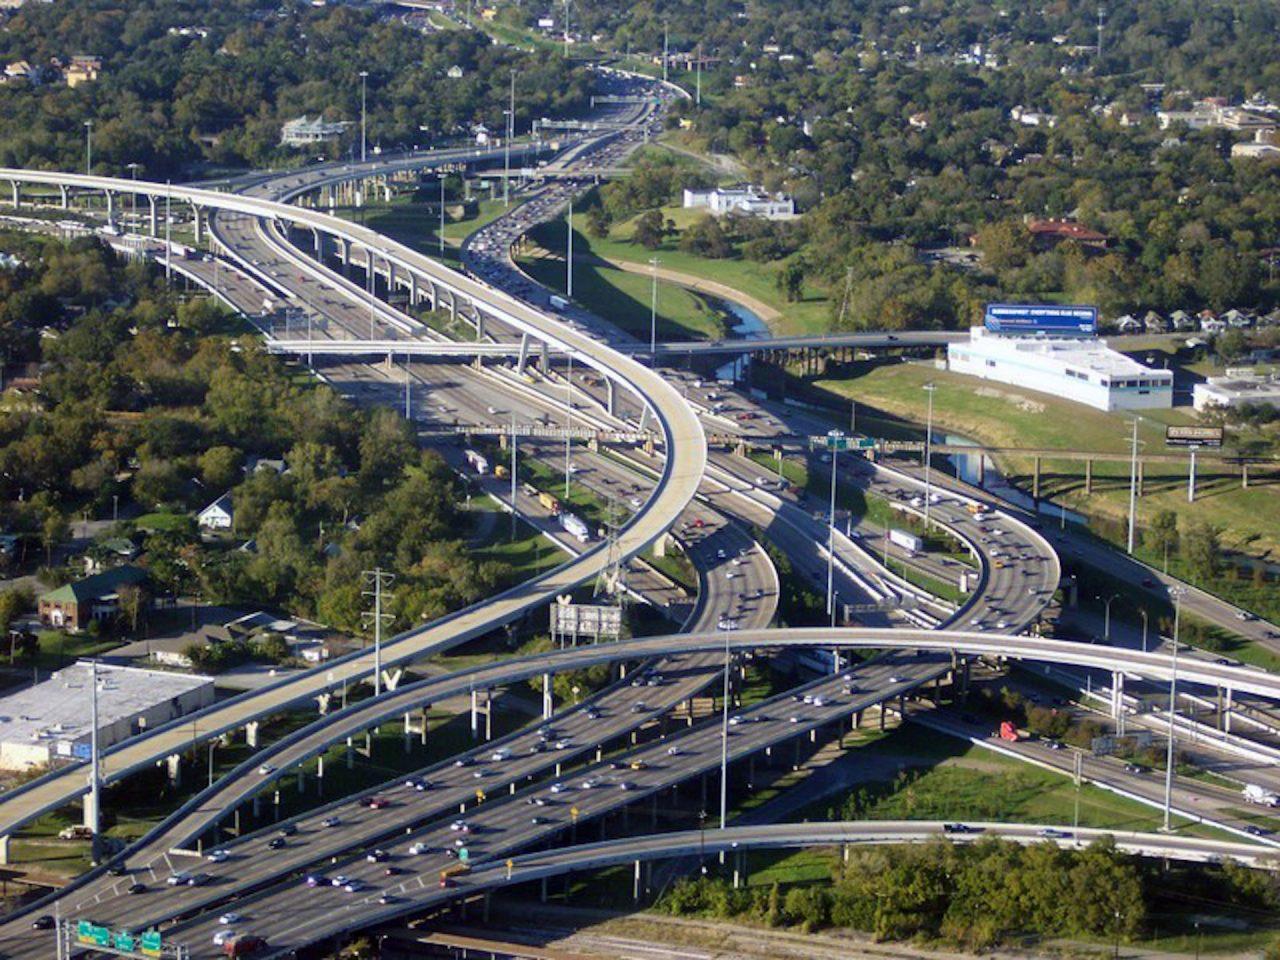 https://thetexan.news/wp-content/uploads/2020/09/houston-toll-roads-1280x960.jpg